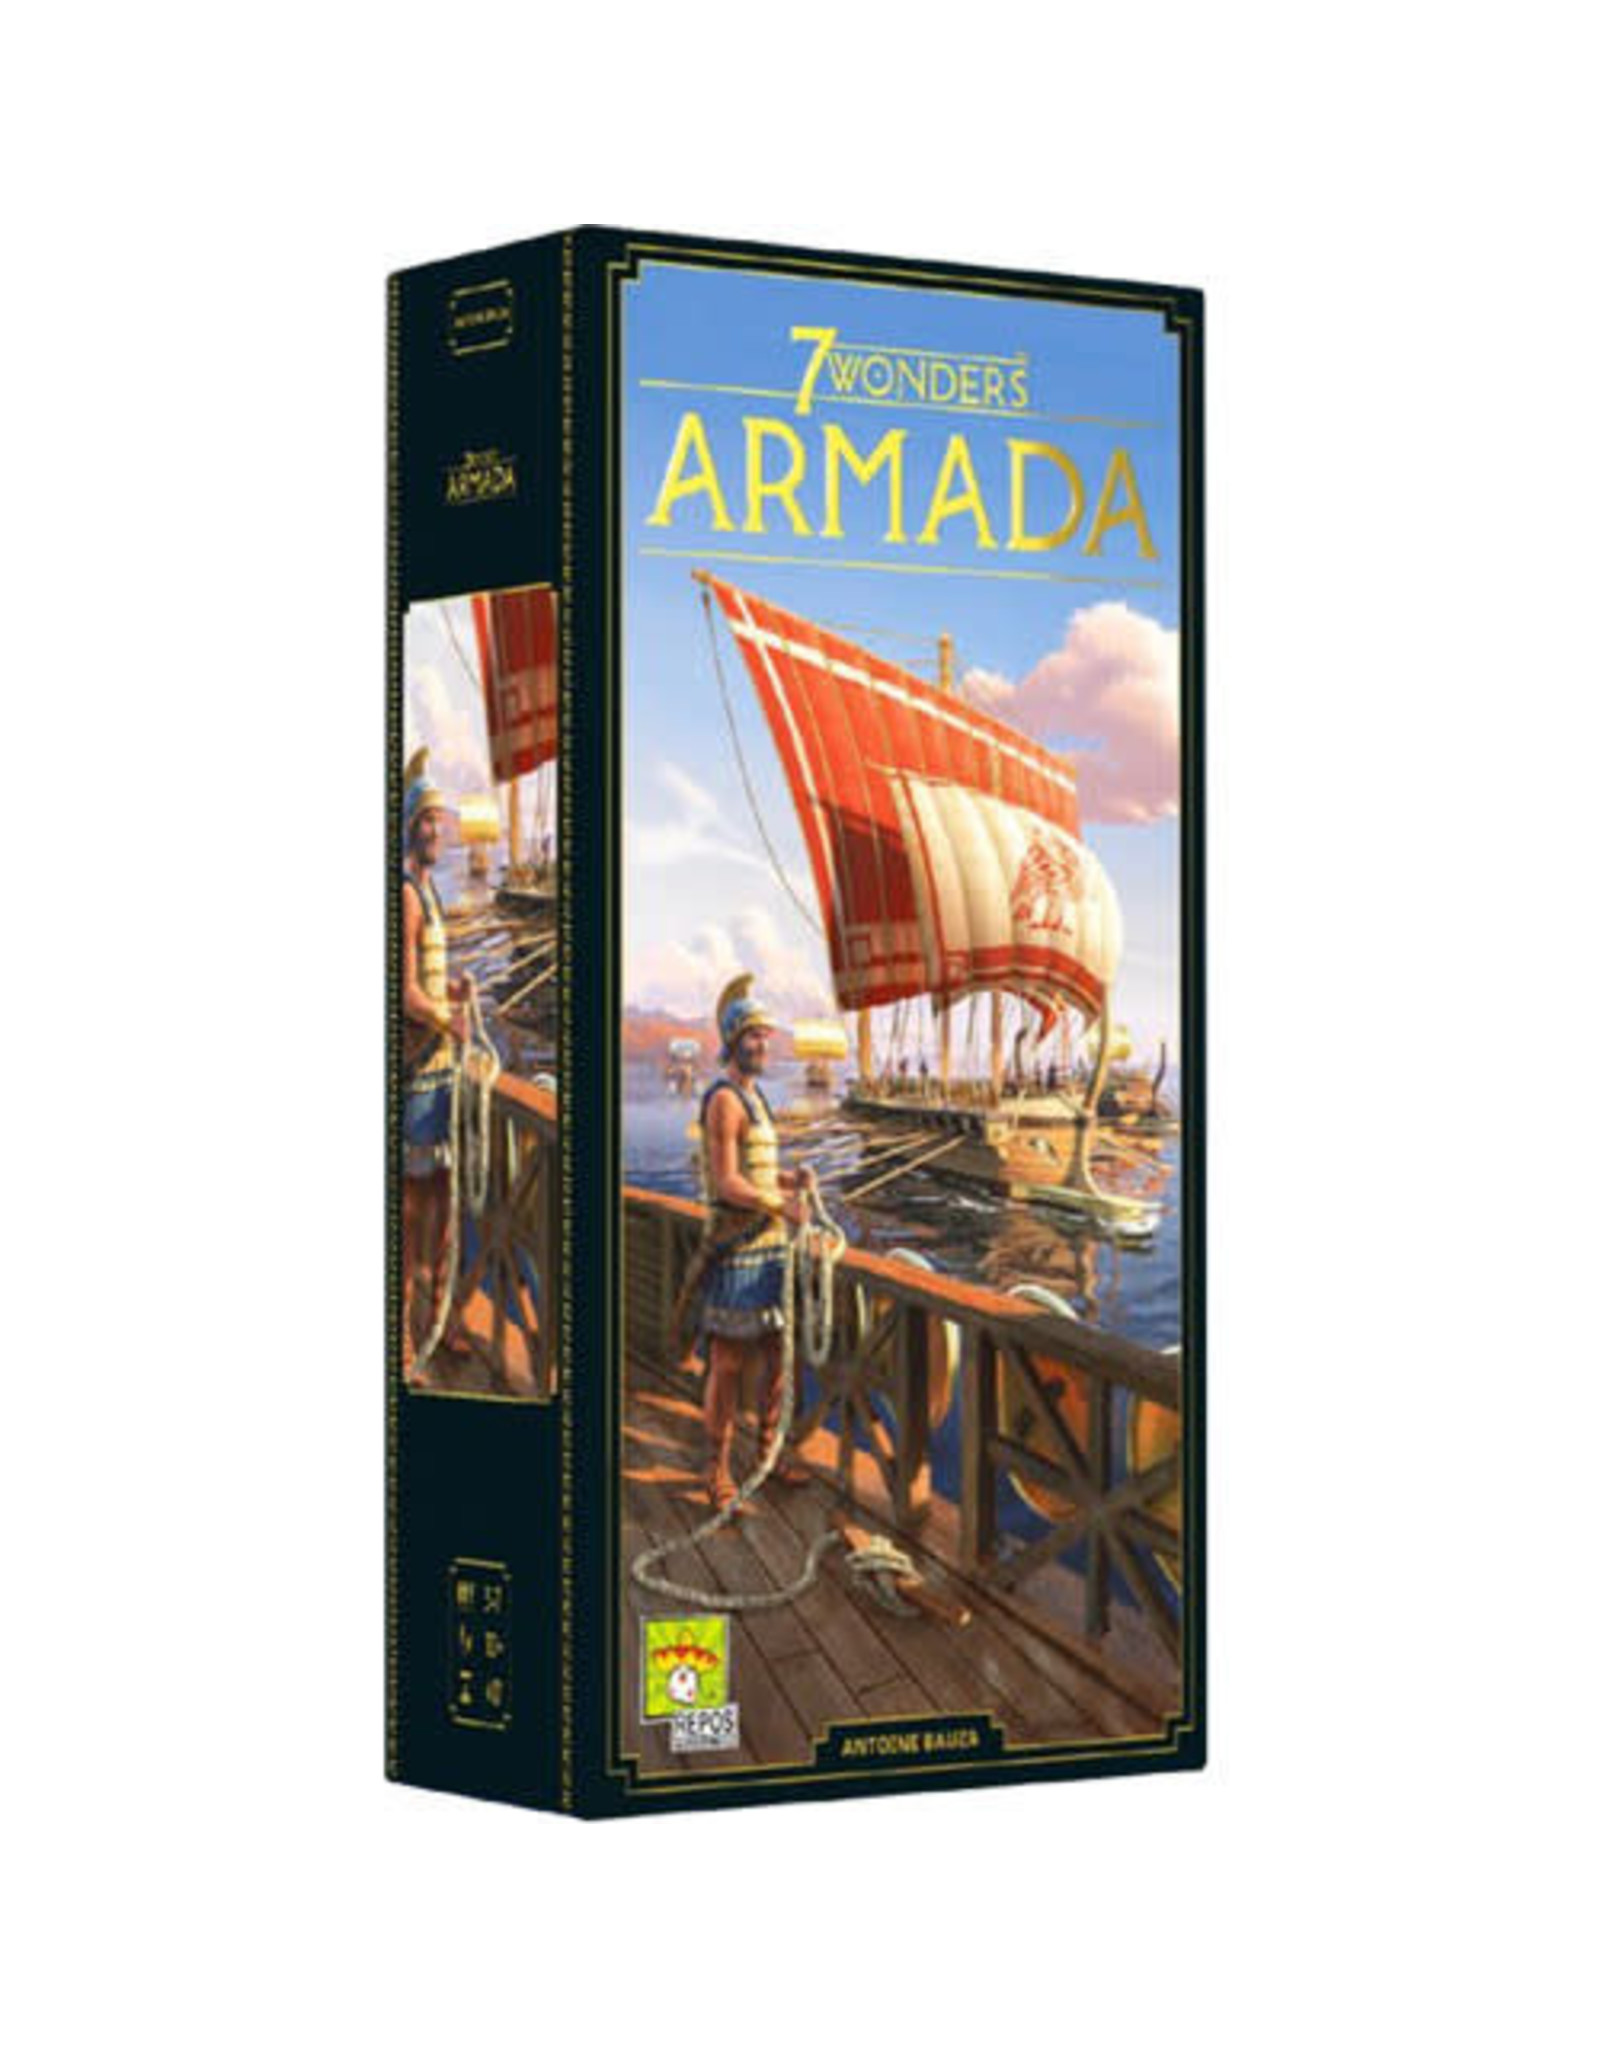 7 Wonders (New Edition) Armada Expansion